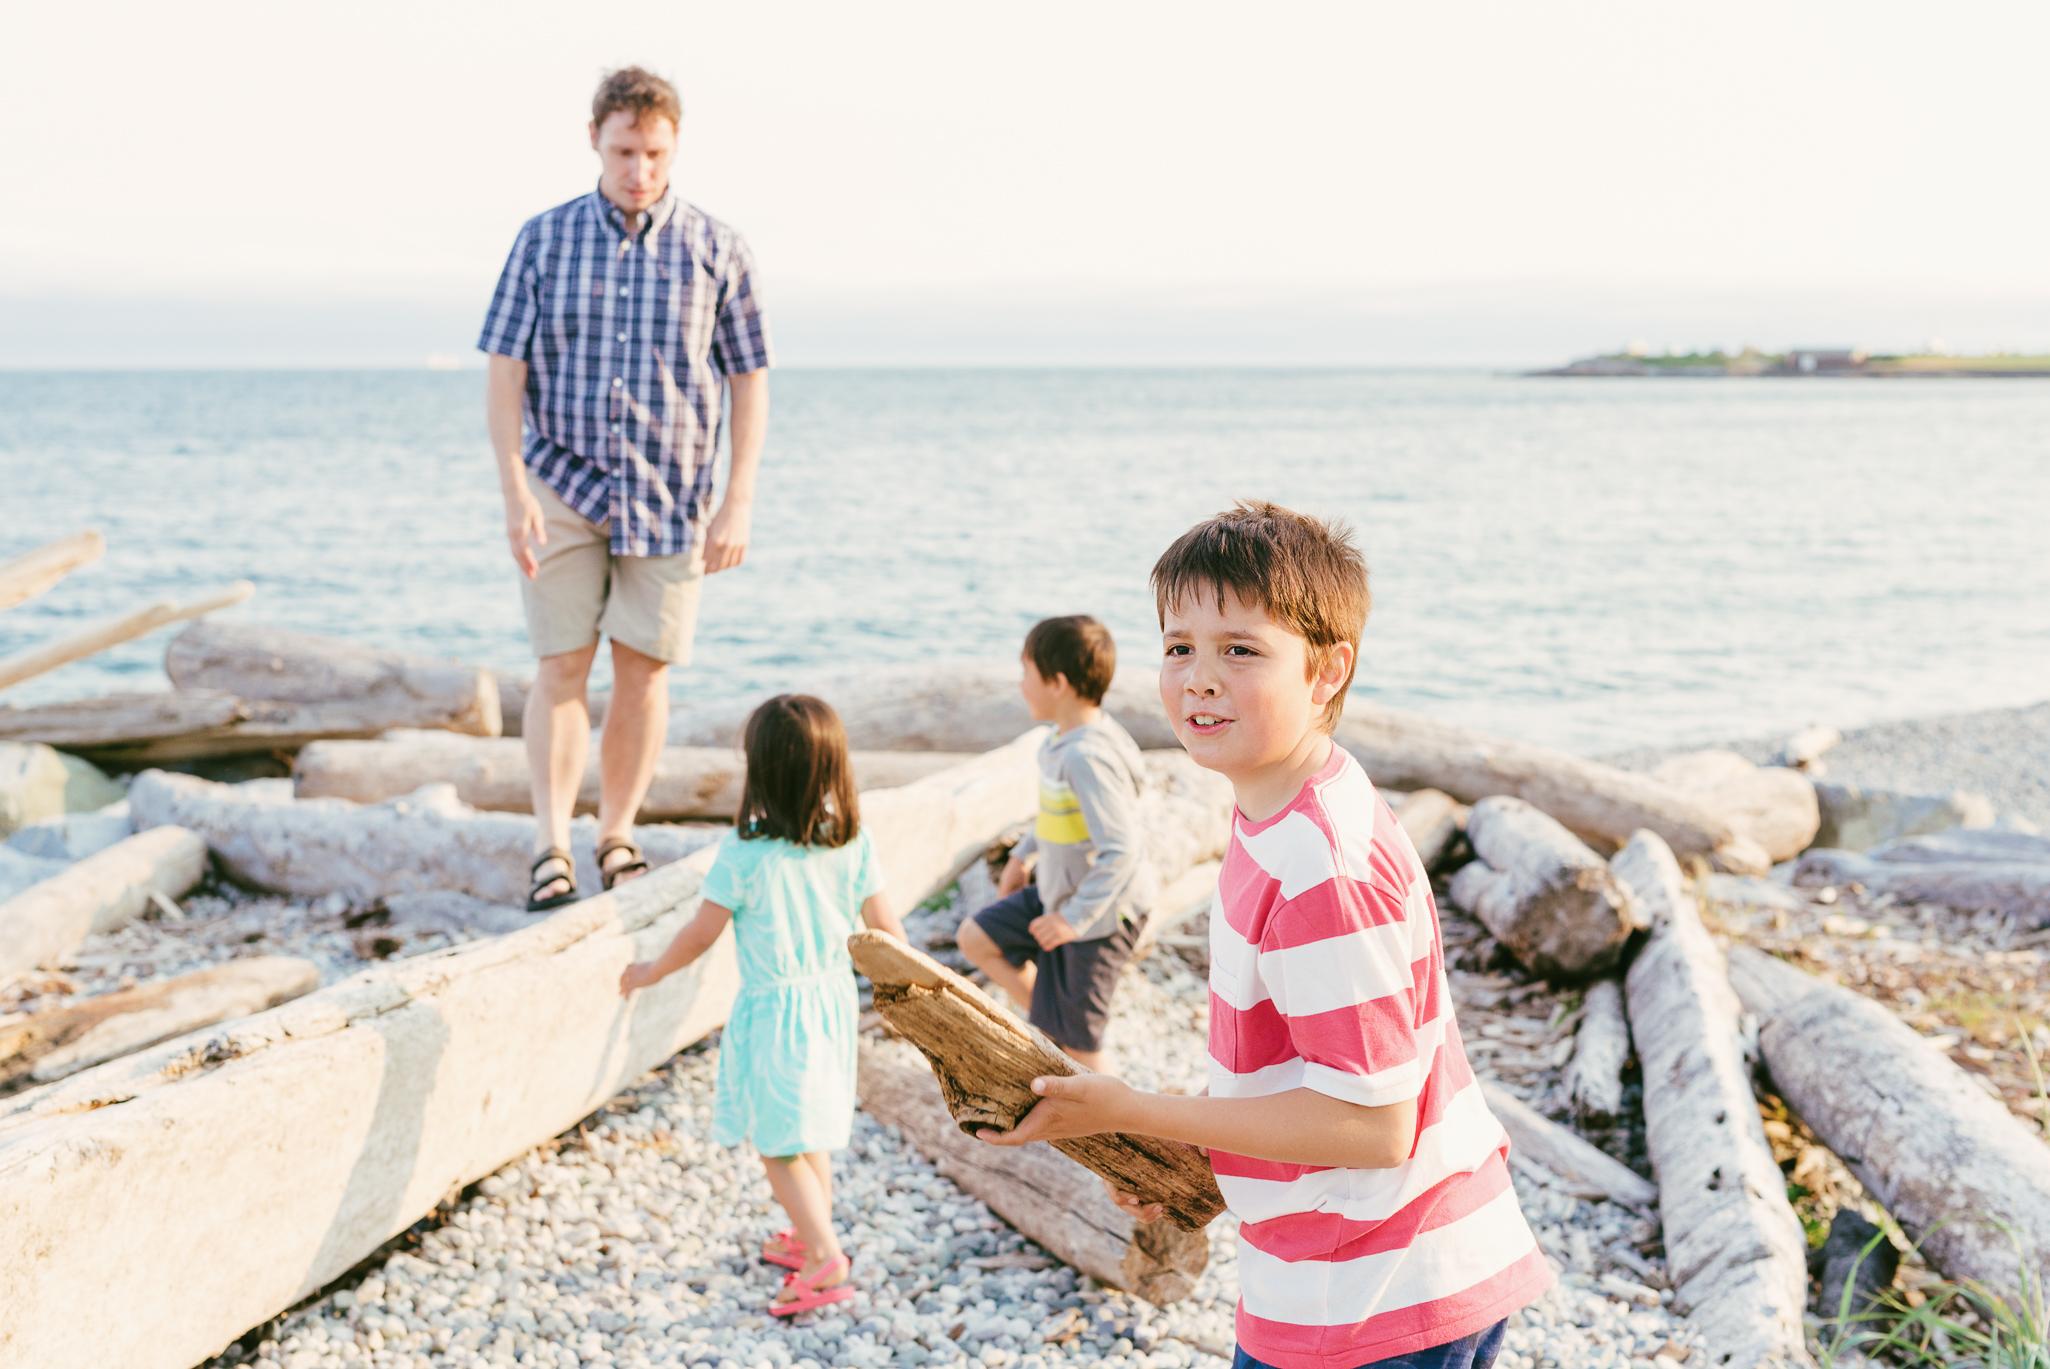 Nicola_Reiersen_Family_Photographer_Victoria_BC.jpg